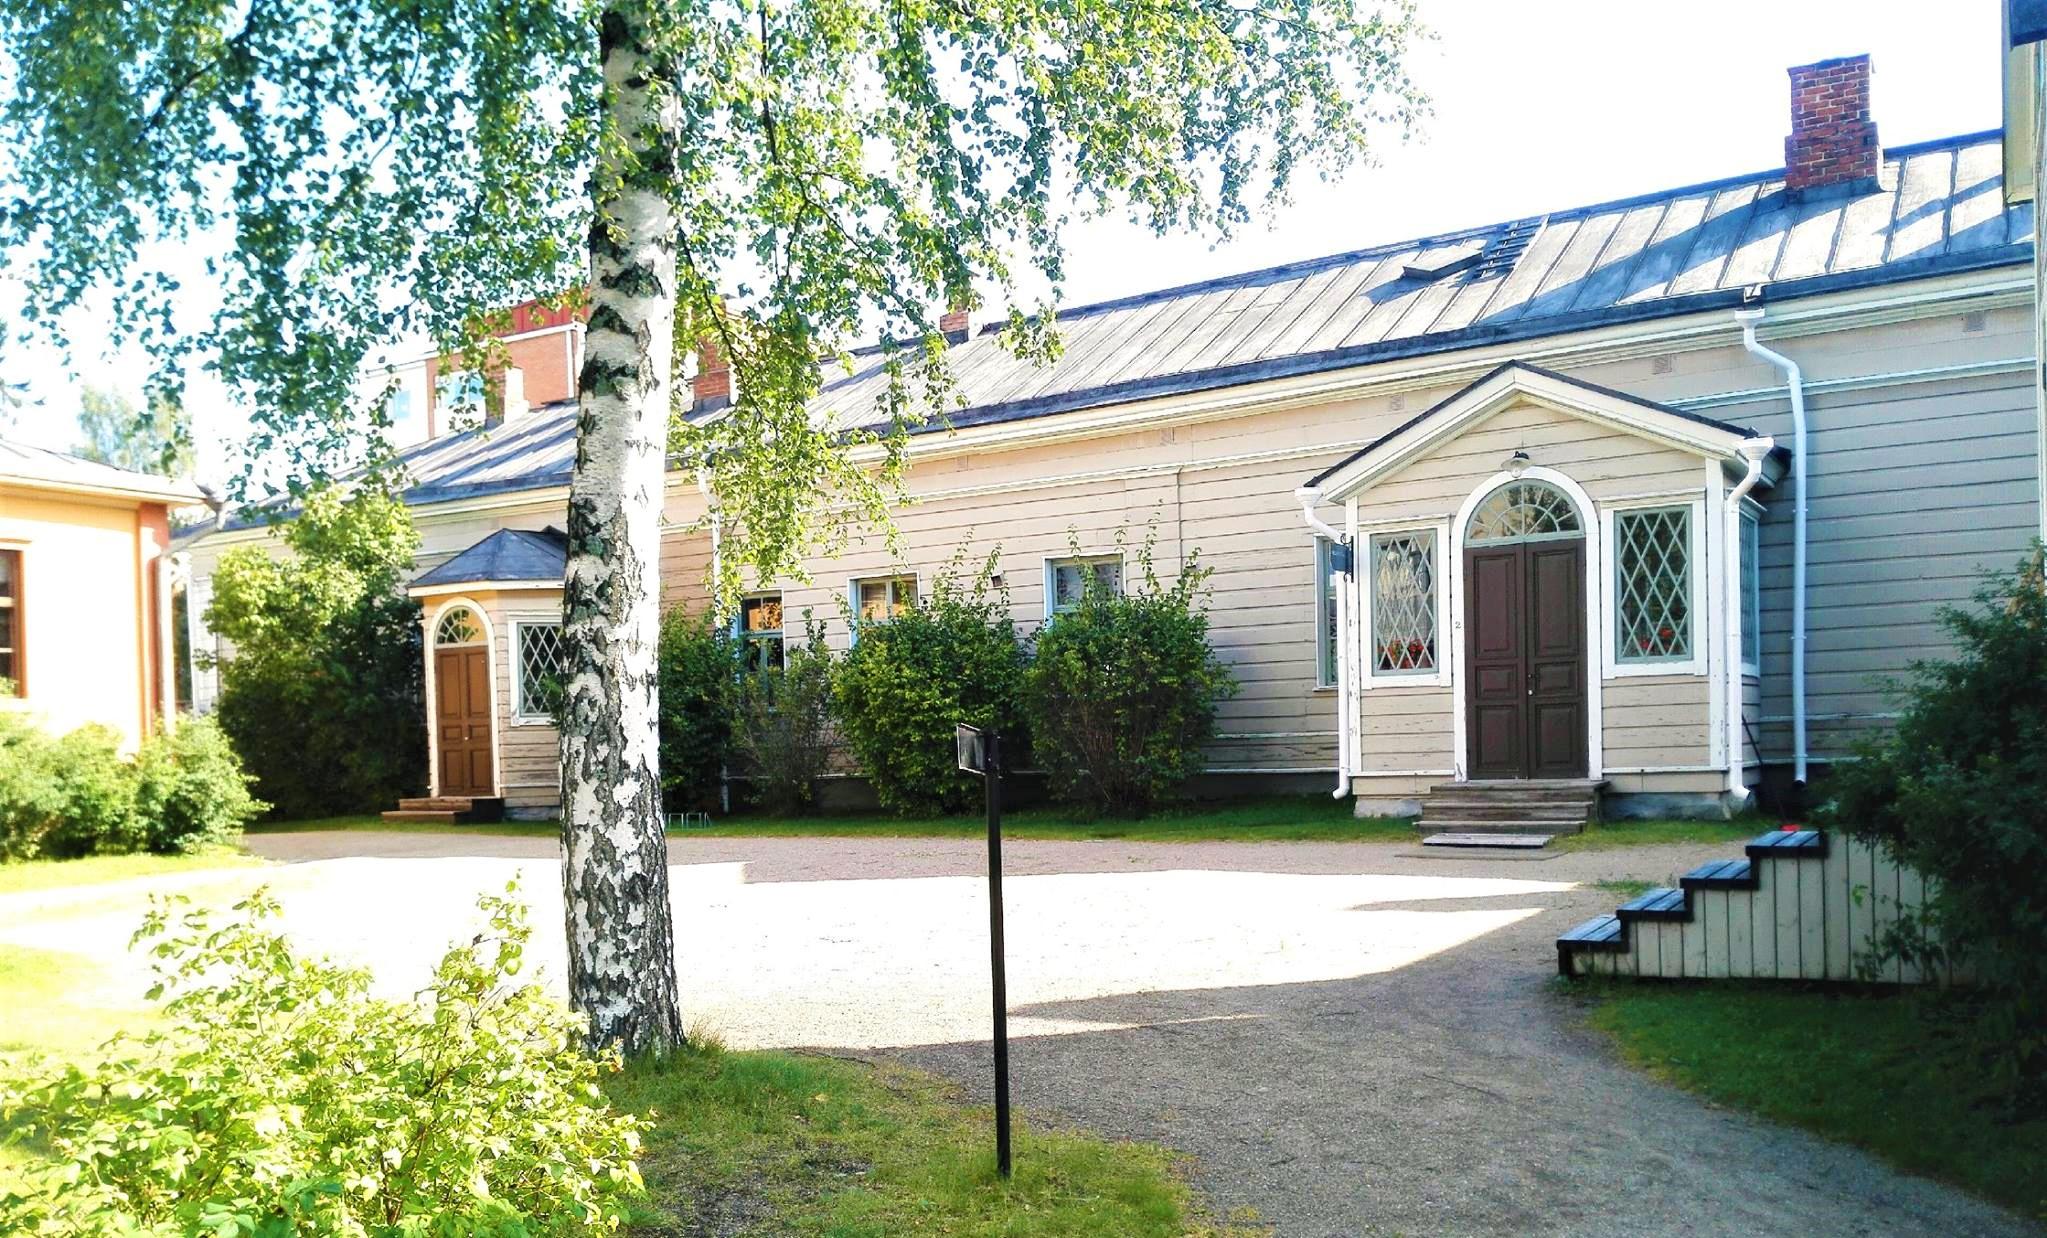 Kuopio Old Town Museum